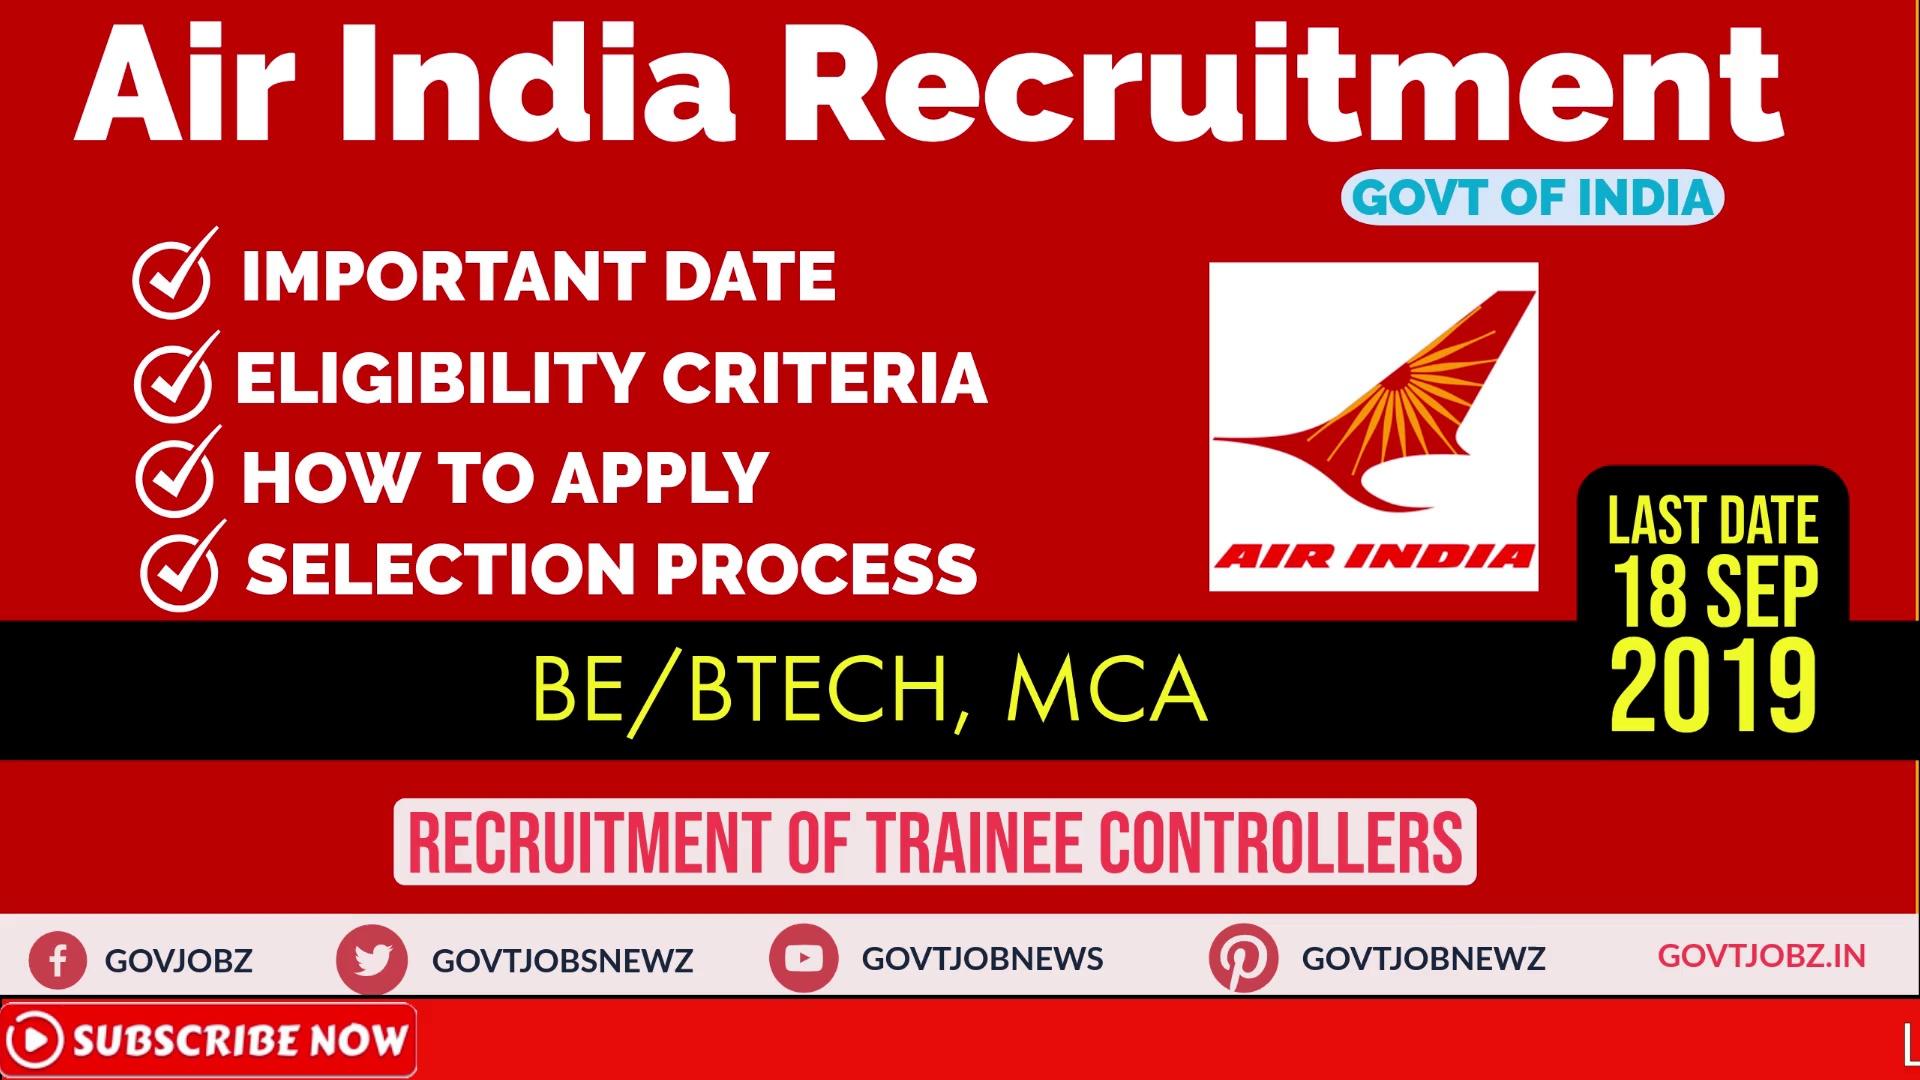 Air india trainee controller recruitment 2019   Latest Govt Jobs   BE/BTECH/MCA